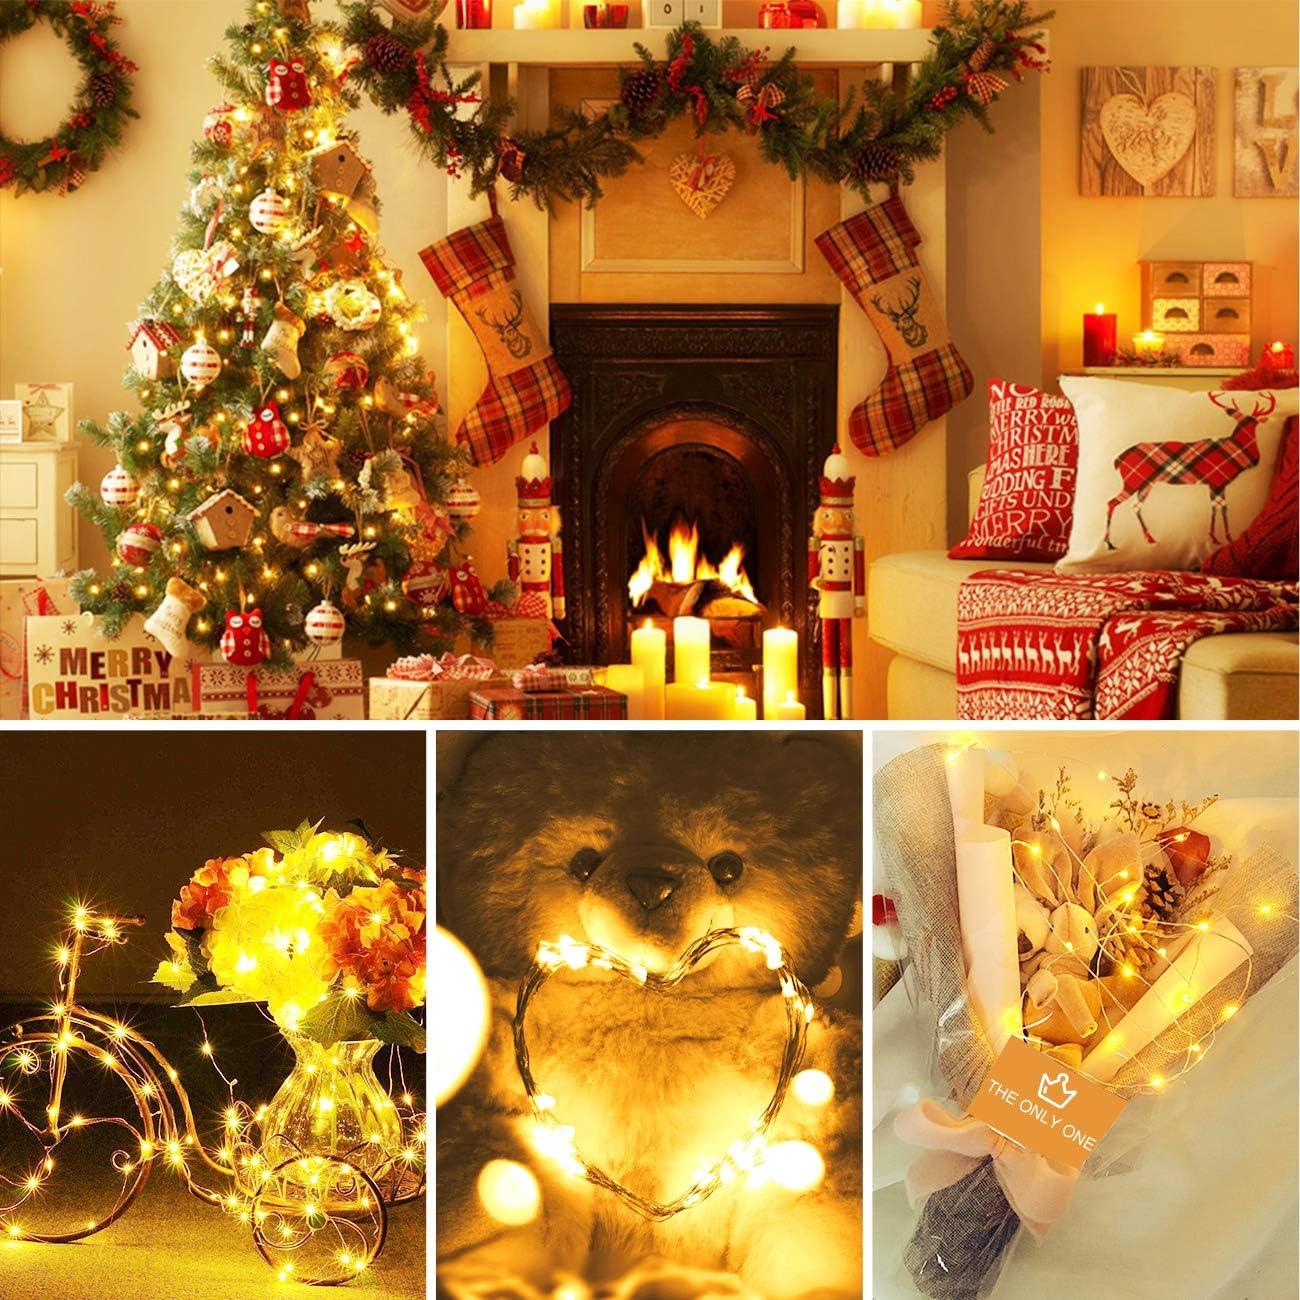 Hepside Luces LED Decoracion 12M 120 LED Guirnalda Luces Pilas 8 Modos Impermeable Luces LED Cadena Micro con Funci/ón de Temporizador para Decoraci/ón Bodas Fiesta de Navidad 2 Pack Guirnalda Luces